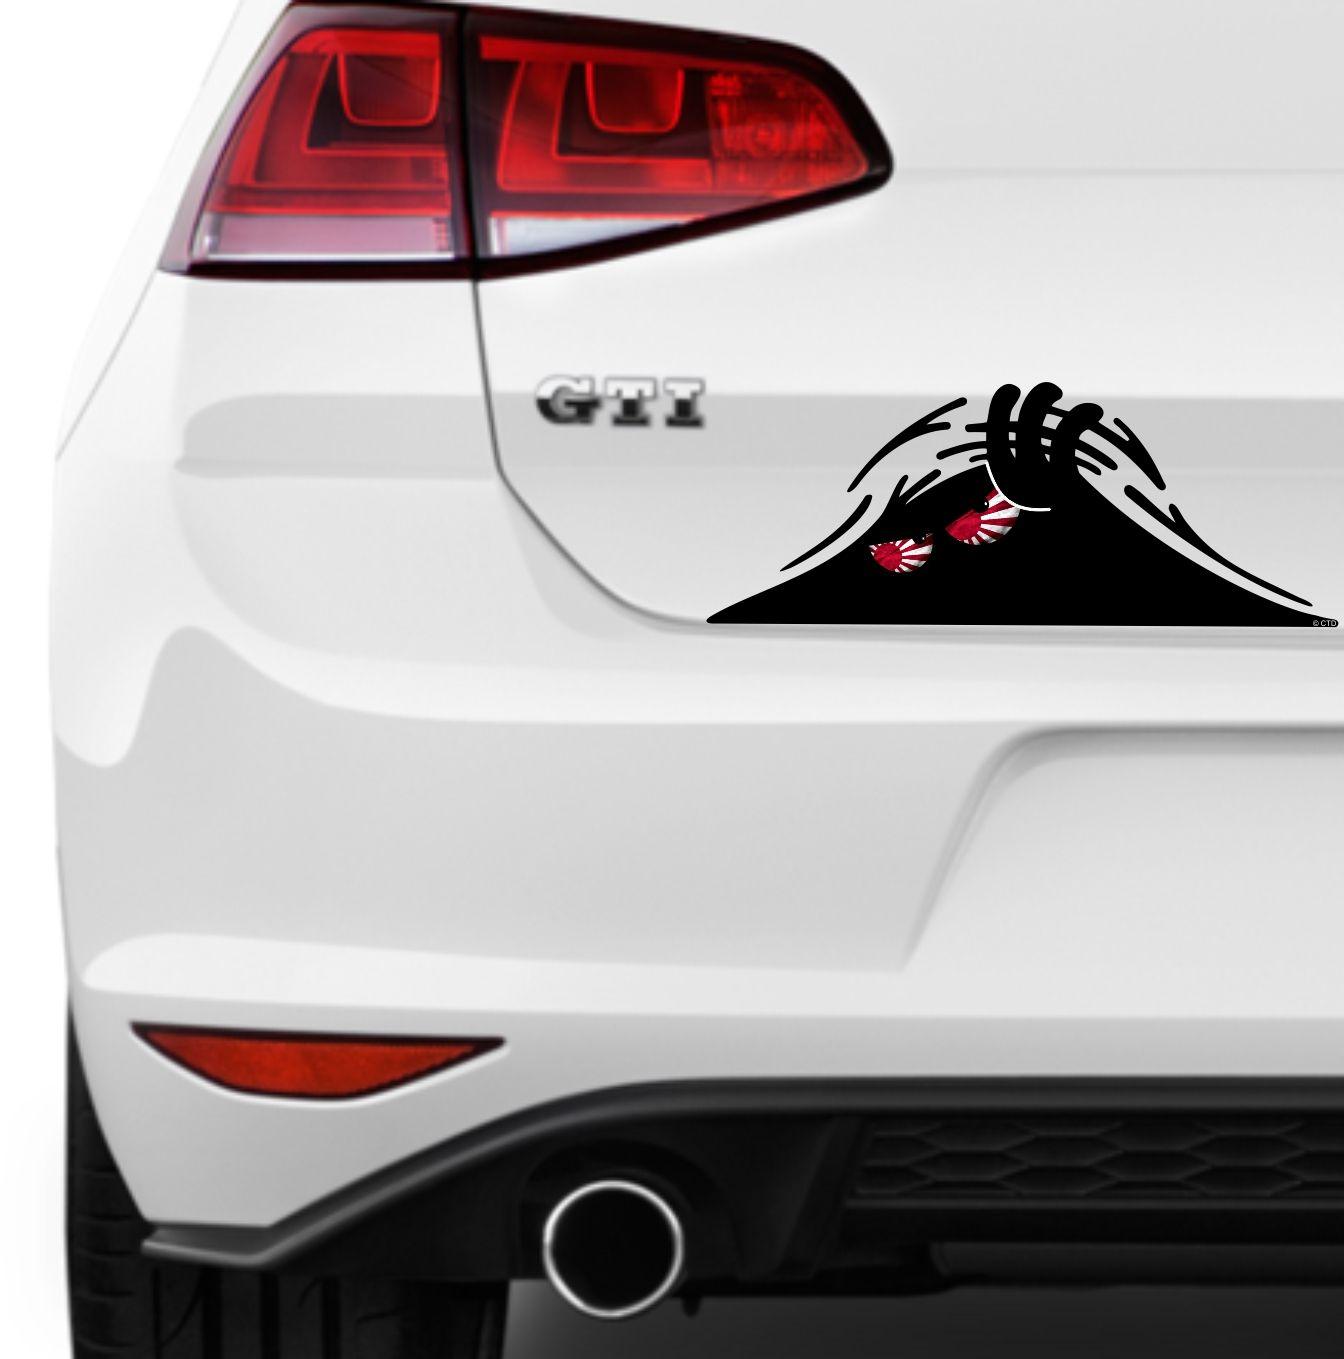 Scary monster peeper with jdm japanese r sun flag evil eyes vinyl car sticker 160x63mm